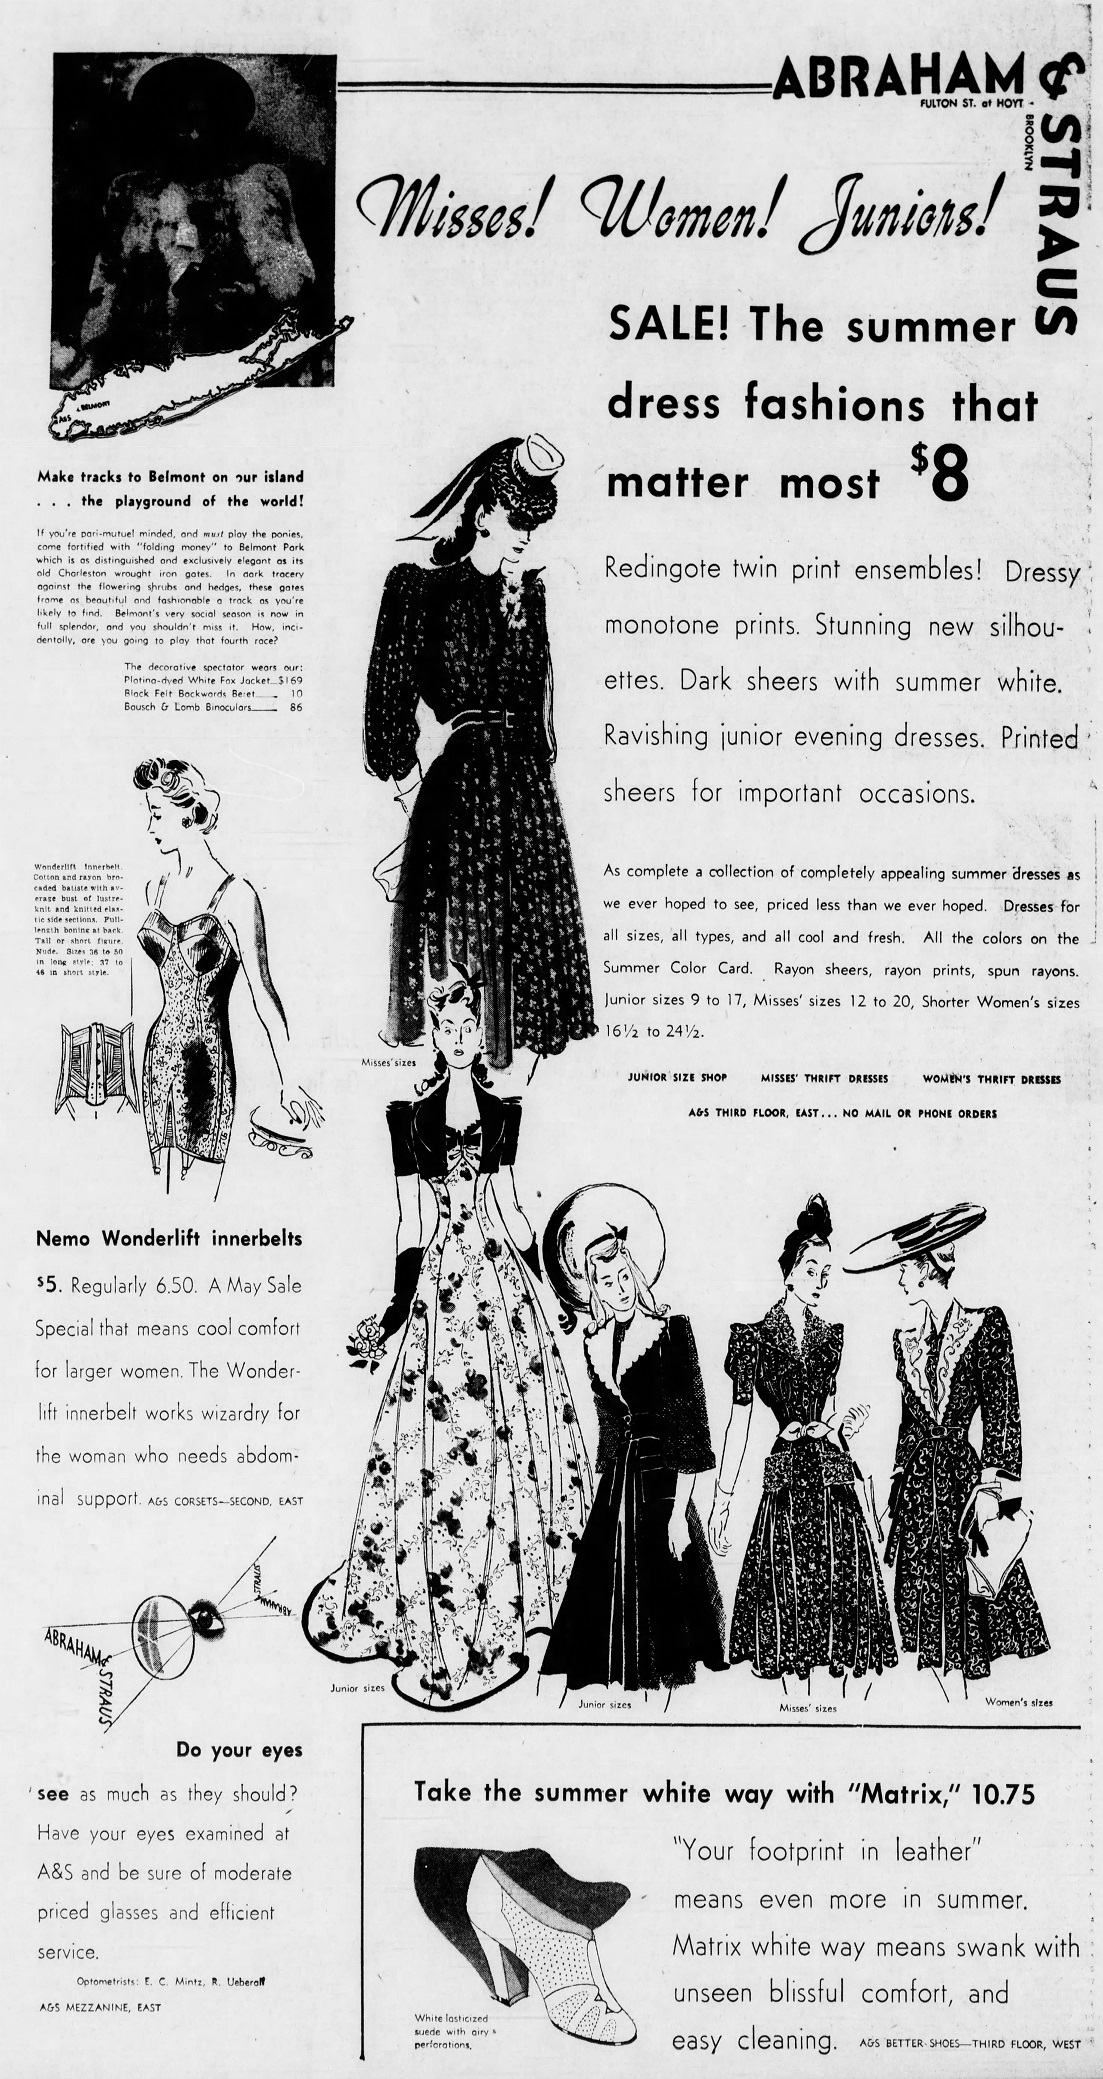 The_Brooklyn_Daily_Eagle_Tue__May_21__1940_(2).jpg